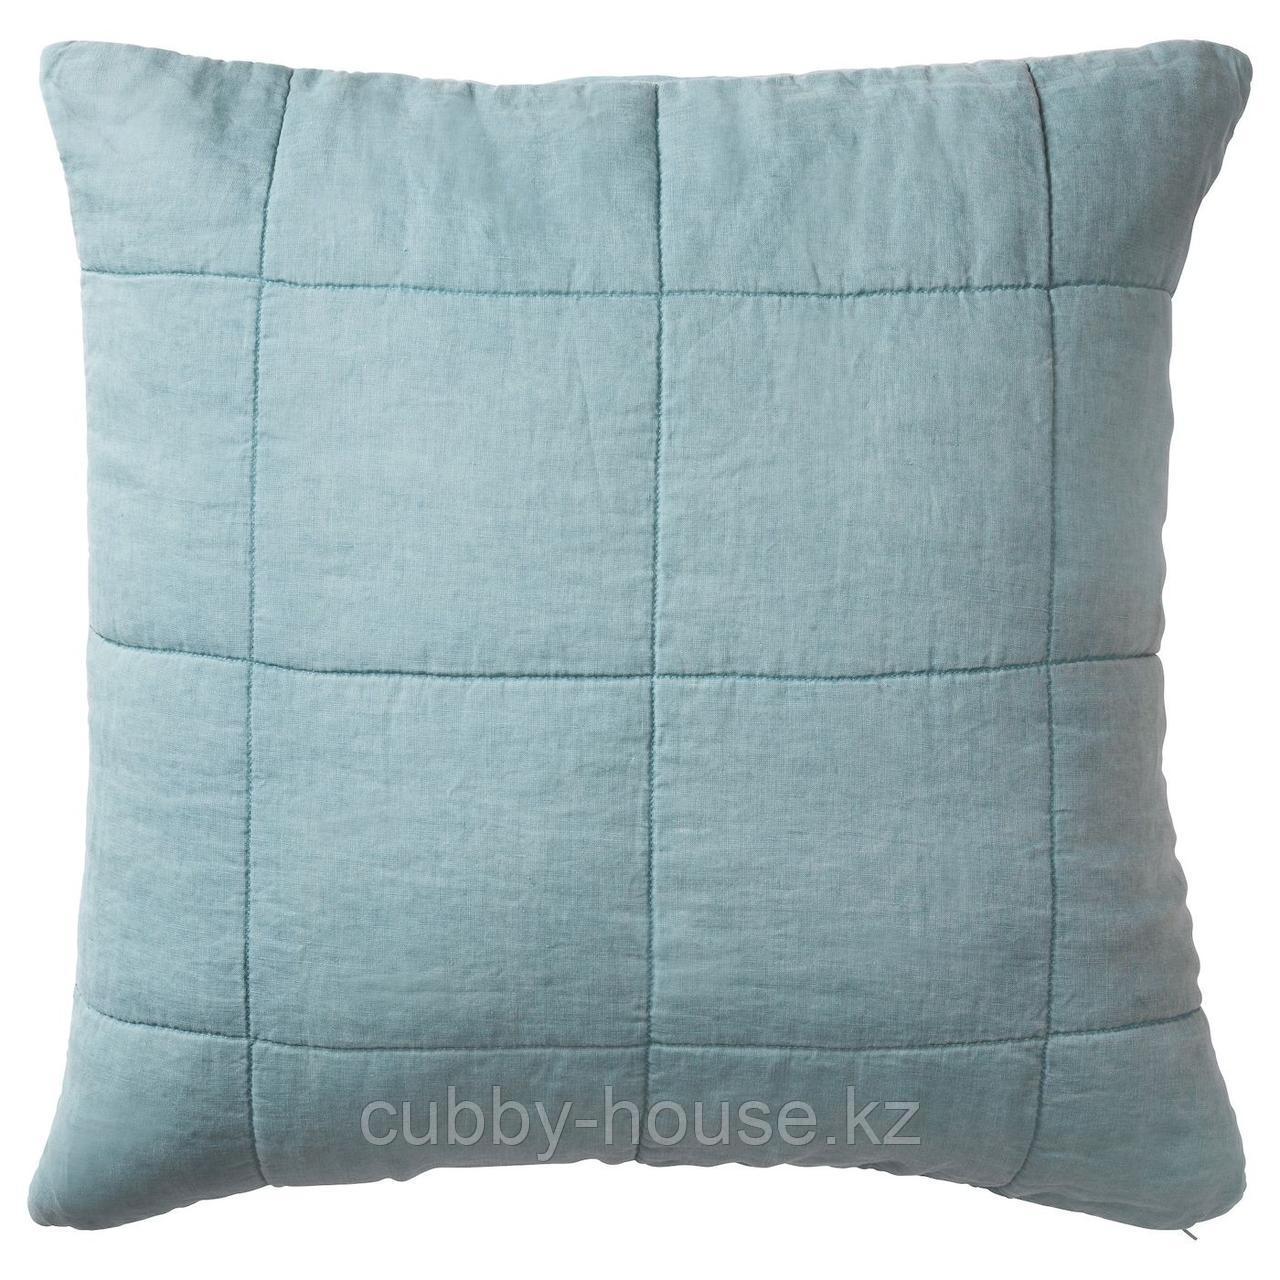 ГУЛЬВЕД Чехол на подушку, зеленый, 65x65 см